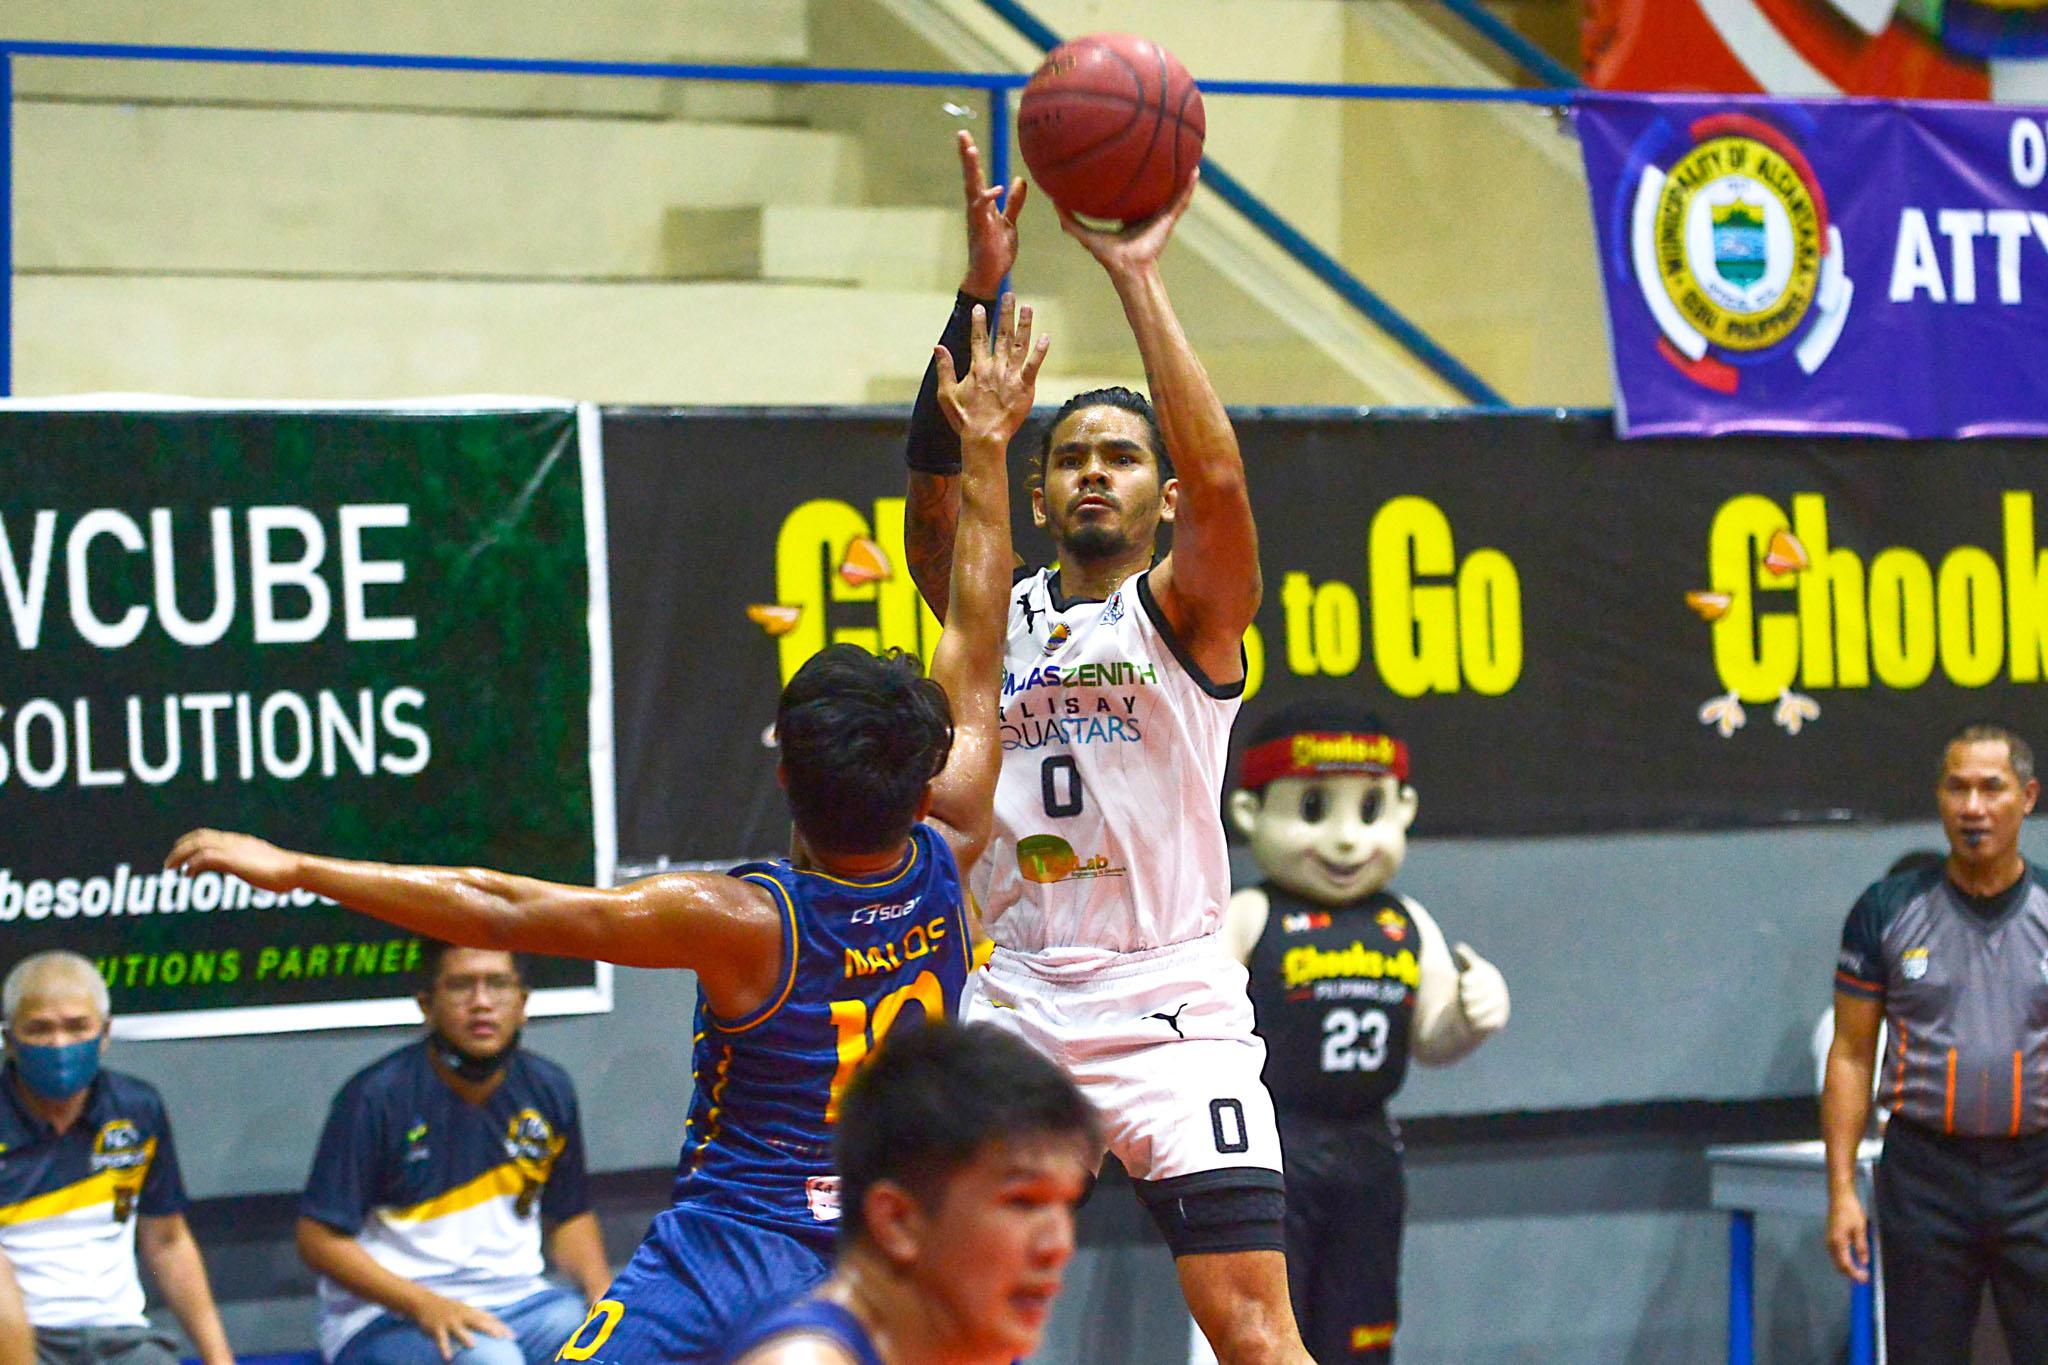 2021-Chooks-to-Go-Pilipinas-VisMin-Super-Cup-Visayas-Talisay-def-Mandaue-Paulo-Hubalde-1 Patrick Cabahug braces for physical KCS defense come VisMin Finals Basketball News VisMin Super Cup  - philippine sports news